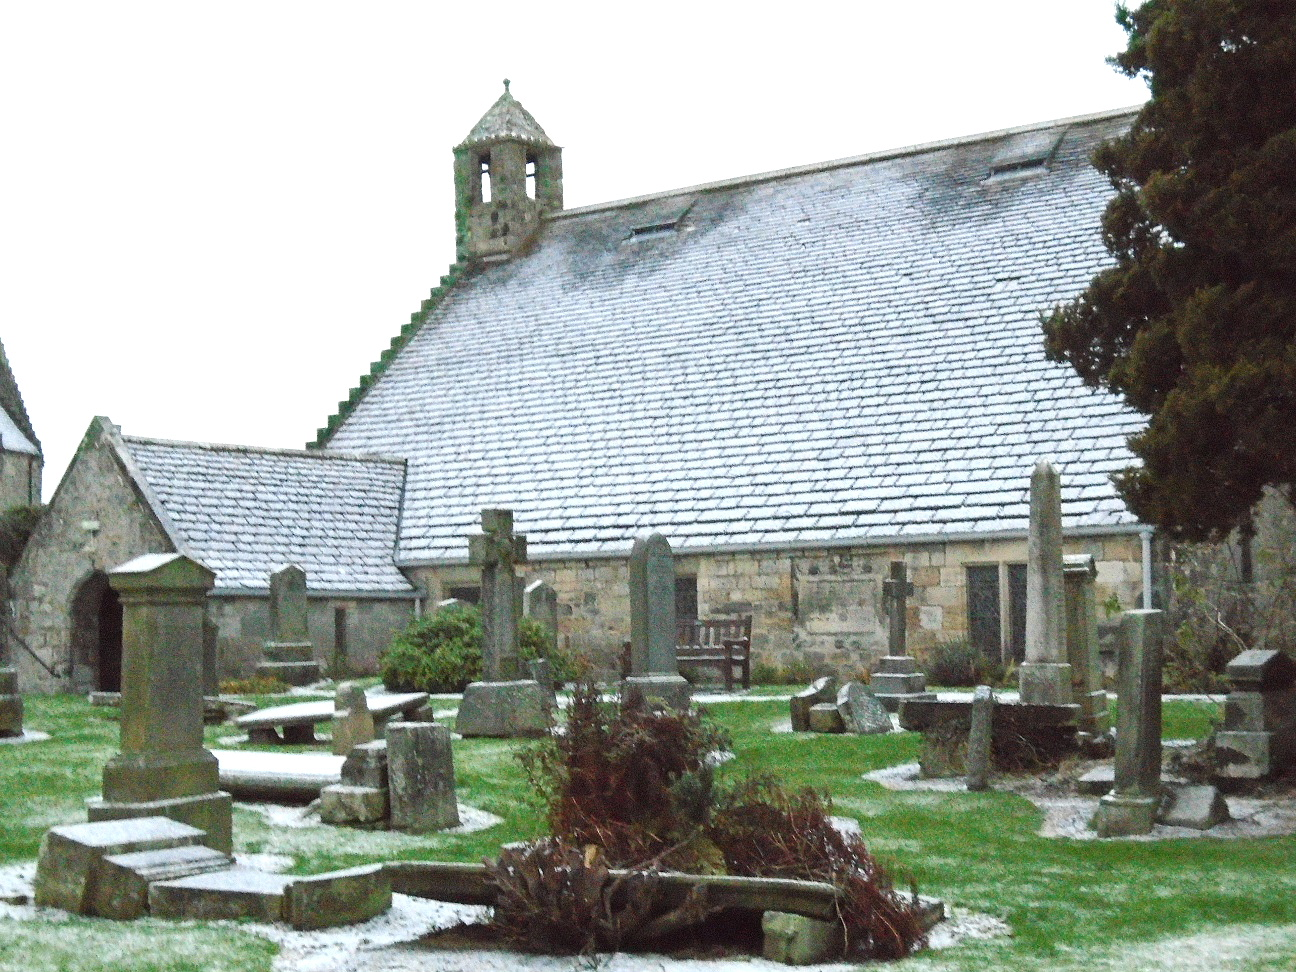 Photo David G - St. Fillan's in snow from SE